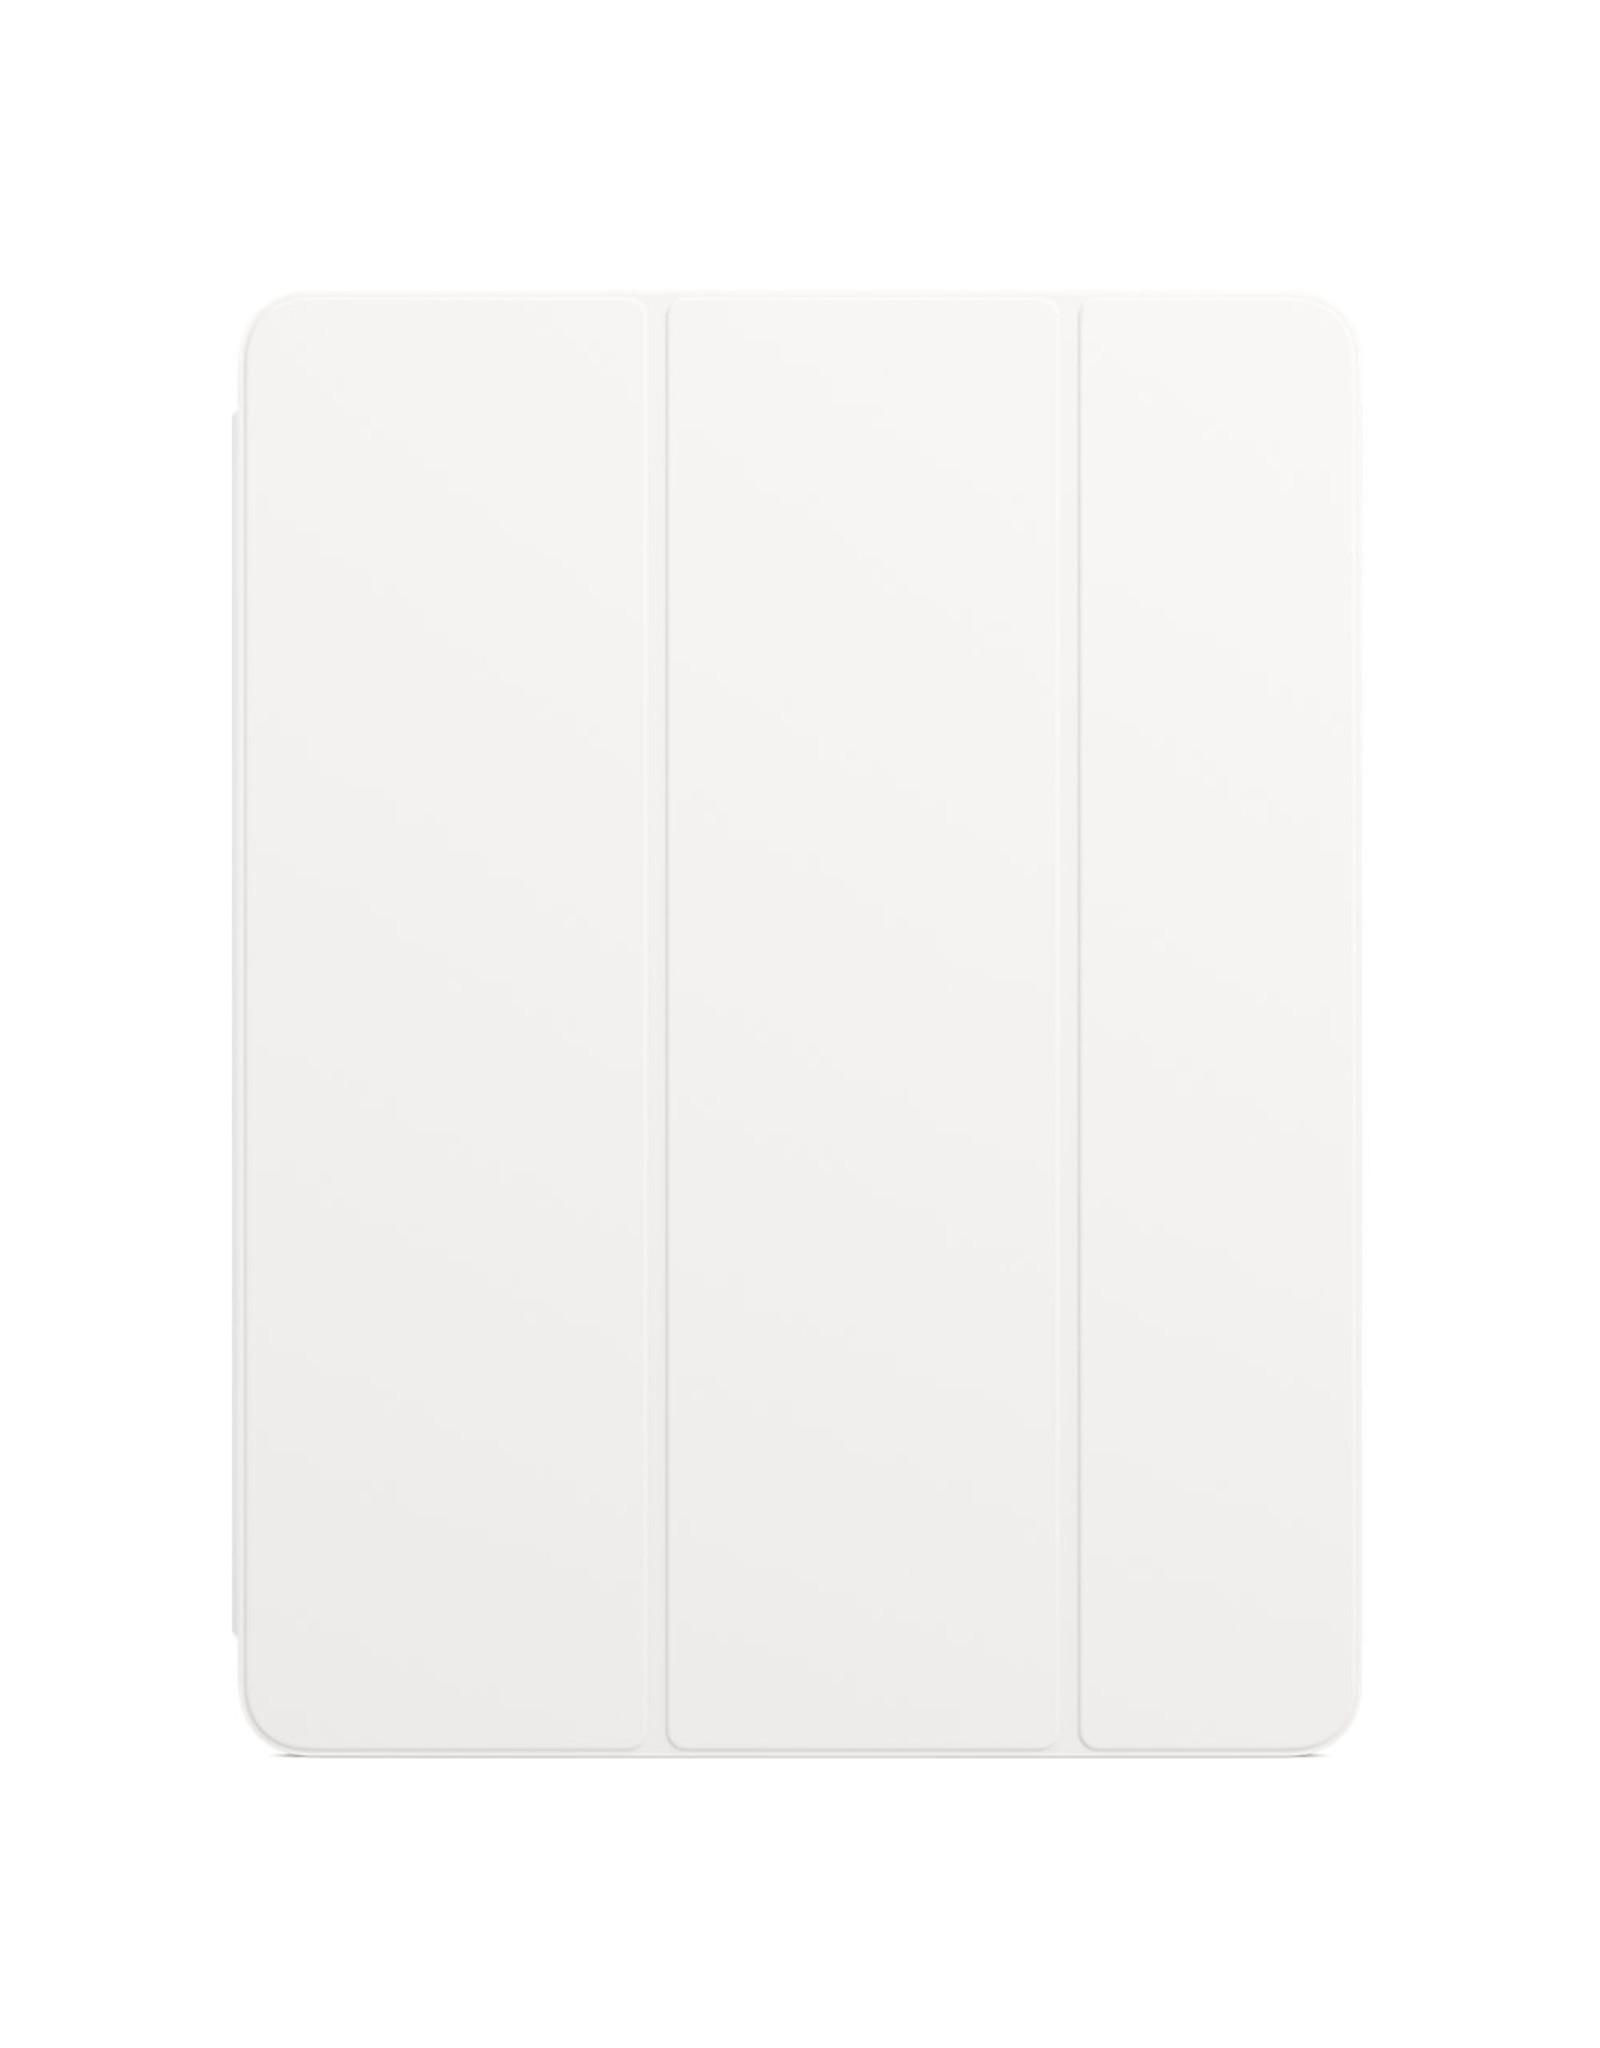 Apple Apple Smart Folio for iPad Pro 12.9-inch (5th generation) - White